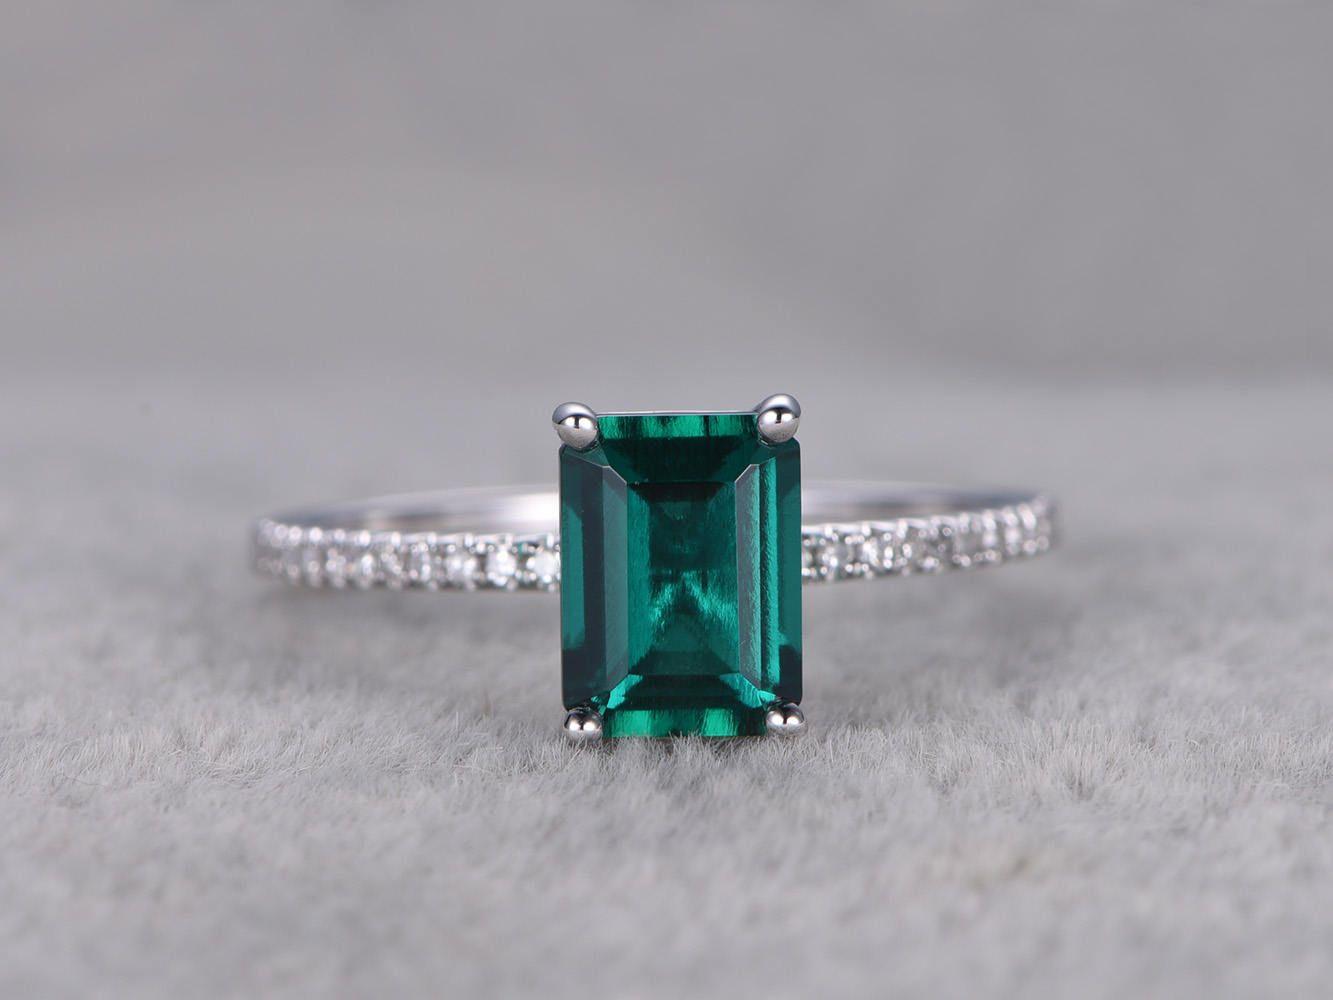 6x8mm Emerald Engagement ring White gold,Diamond wedding band,14k,Emerelad Cut Treated Emerald,Green Gemstone Promise Ring,Bridal Ring,Prong by popRing on Etsy